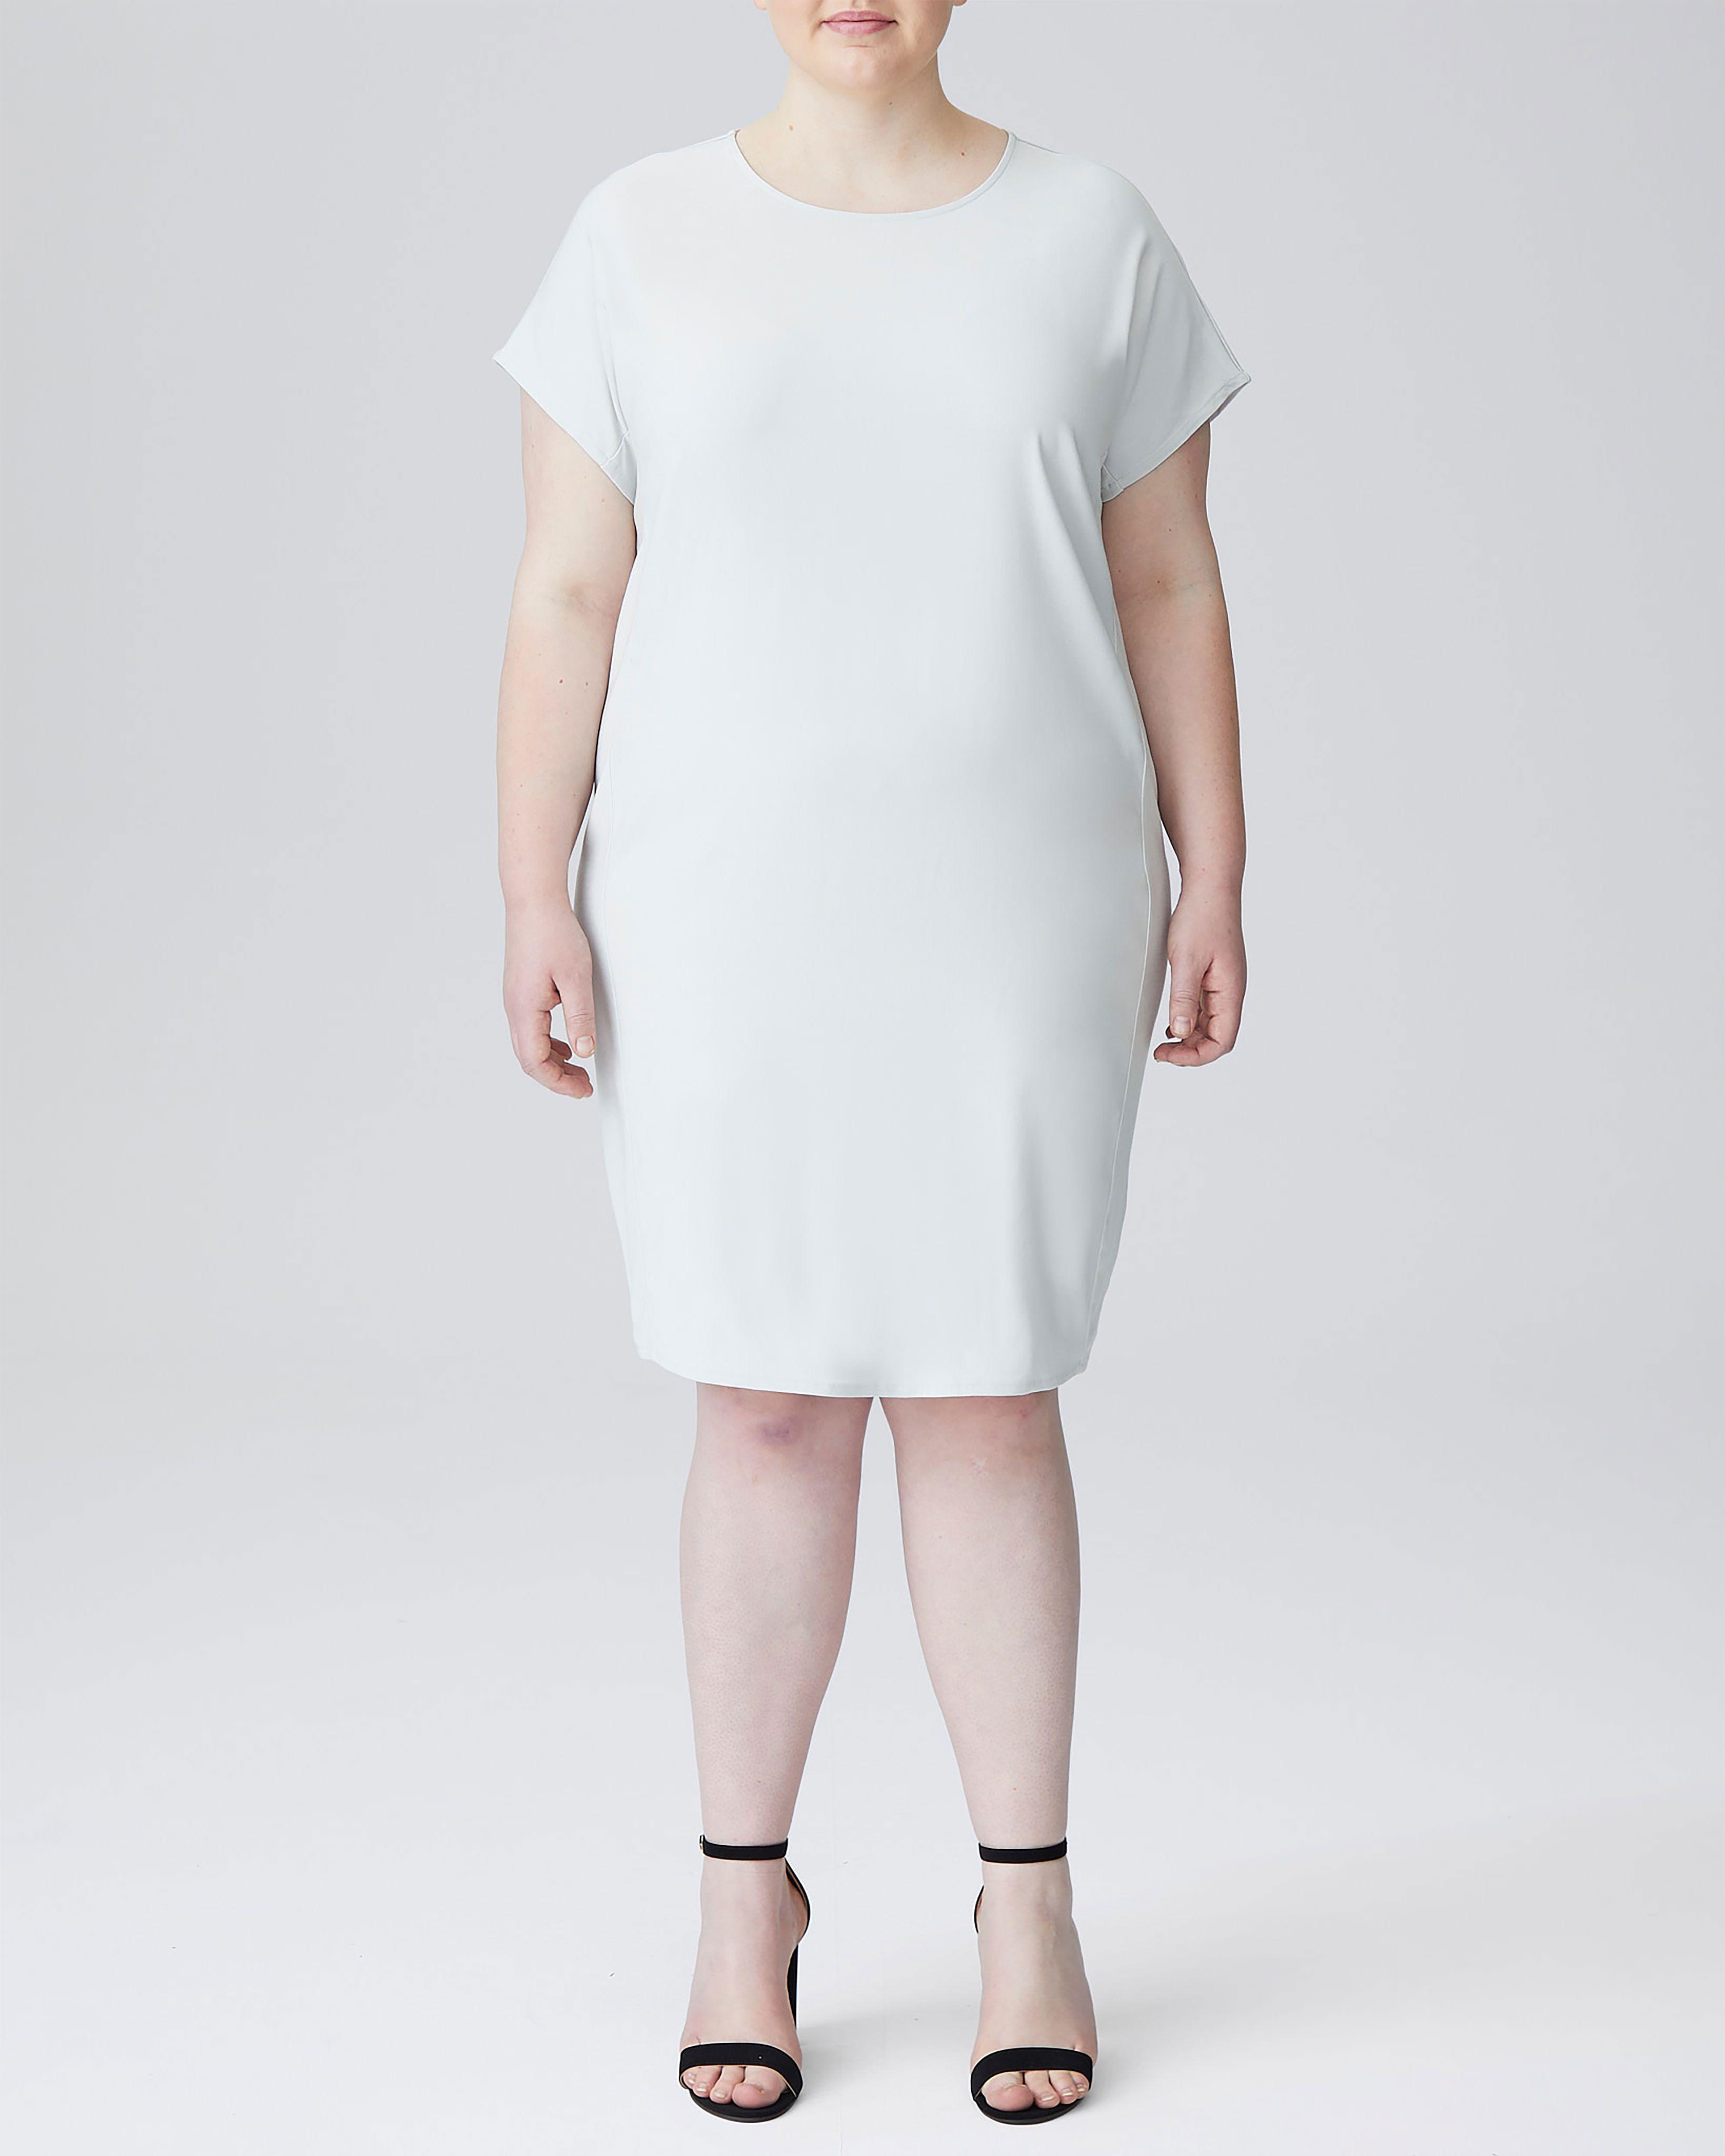 Isabelle Luxe Twill Sheath Dress - Black